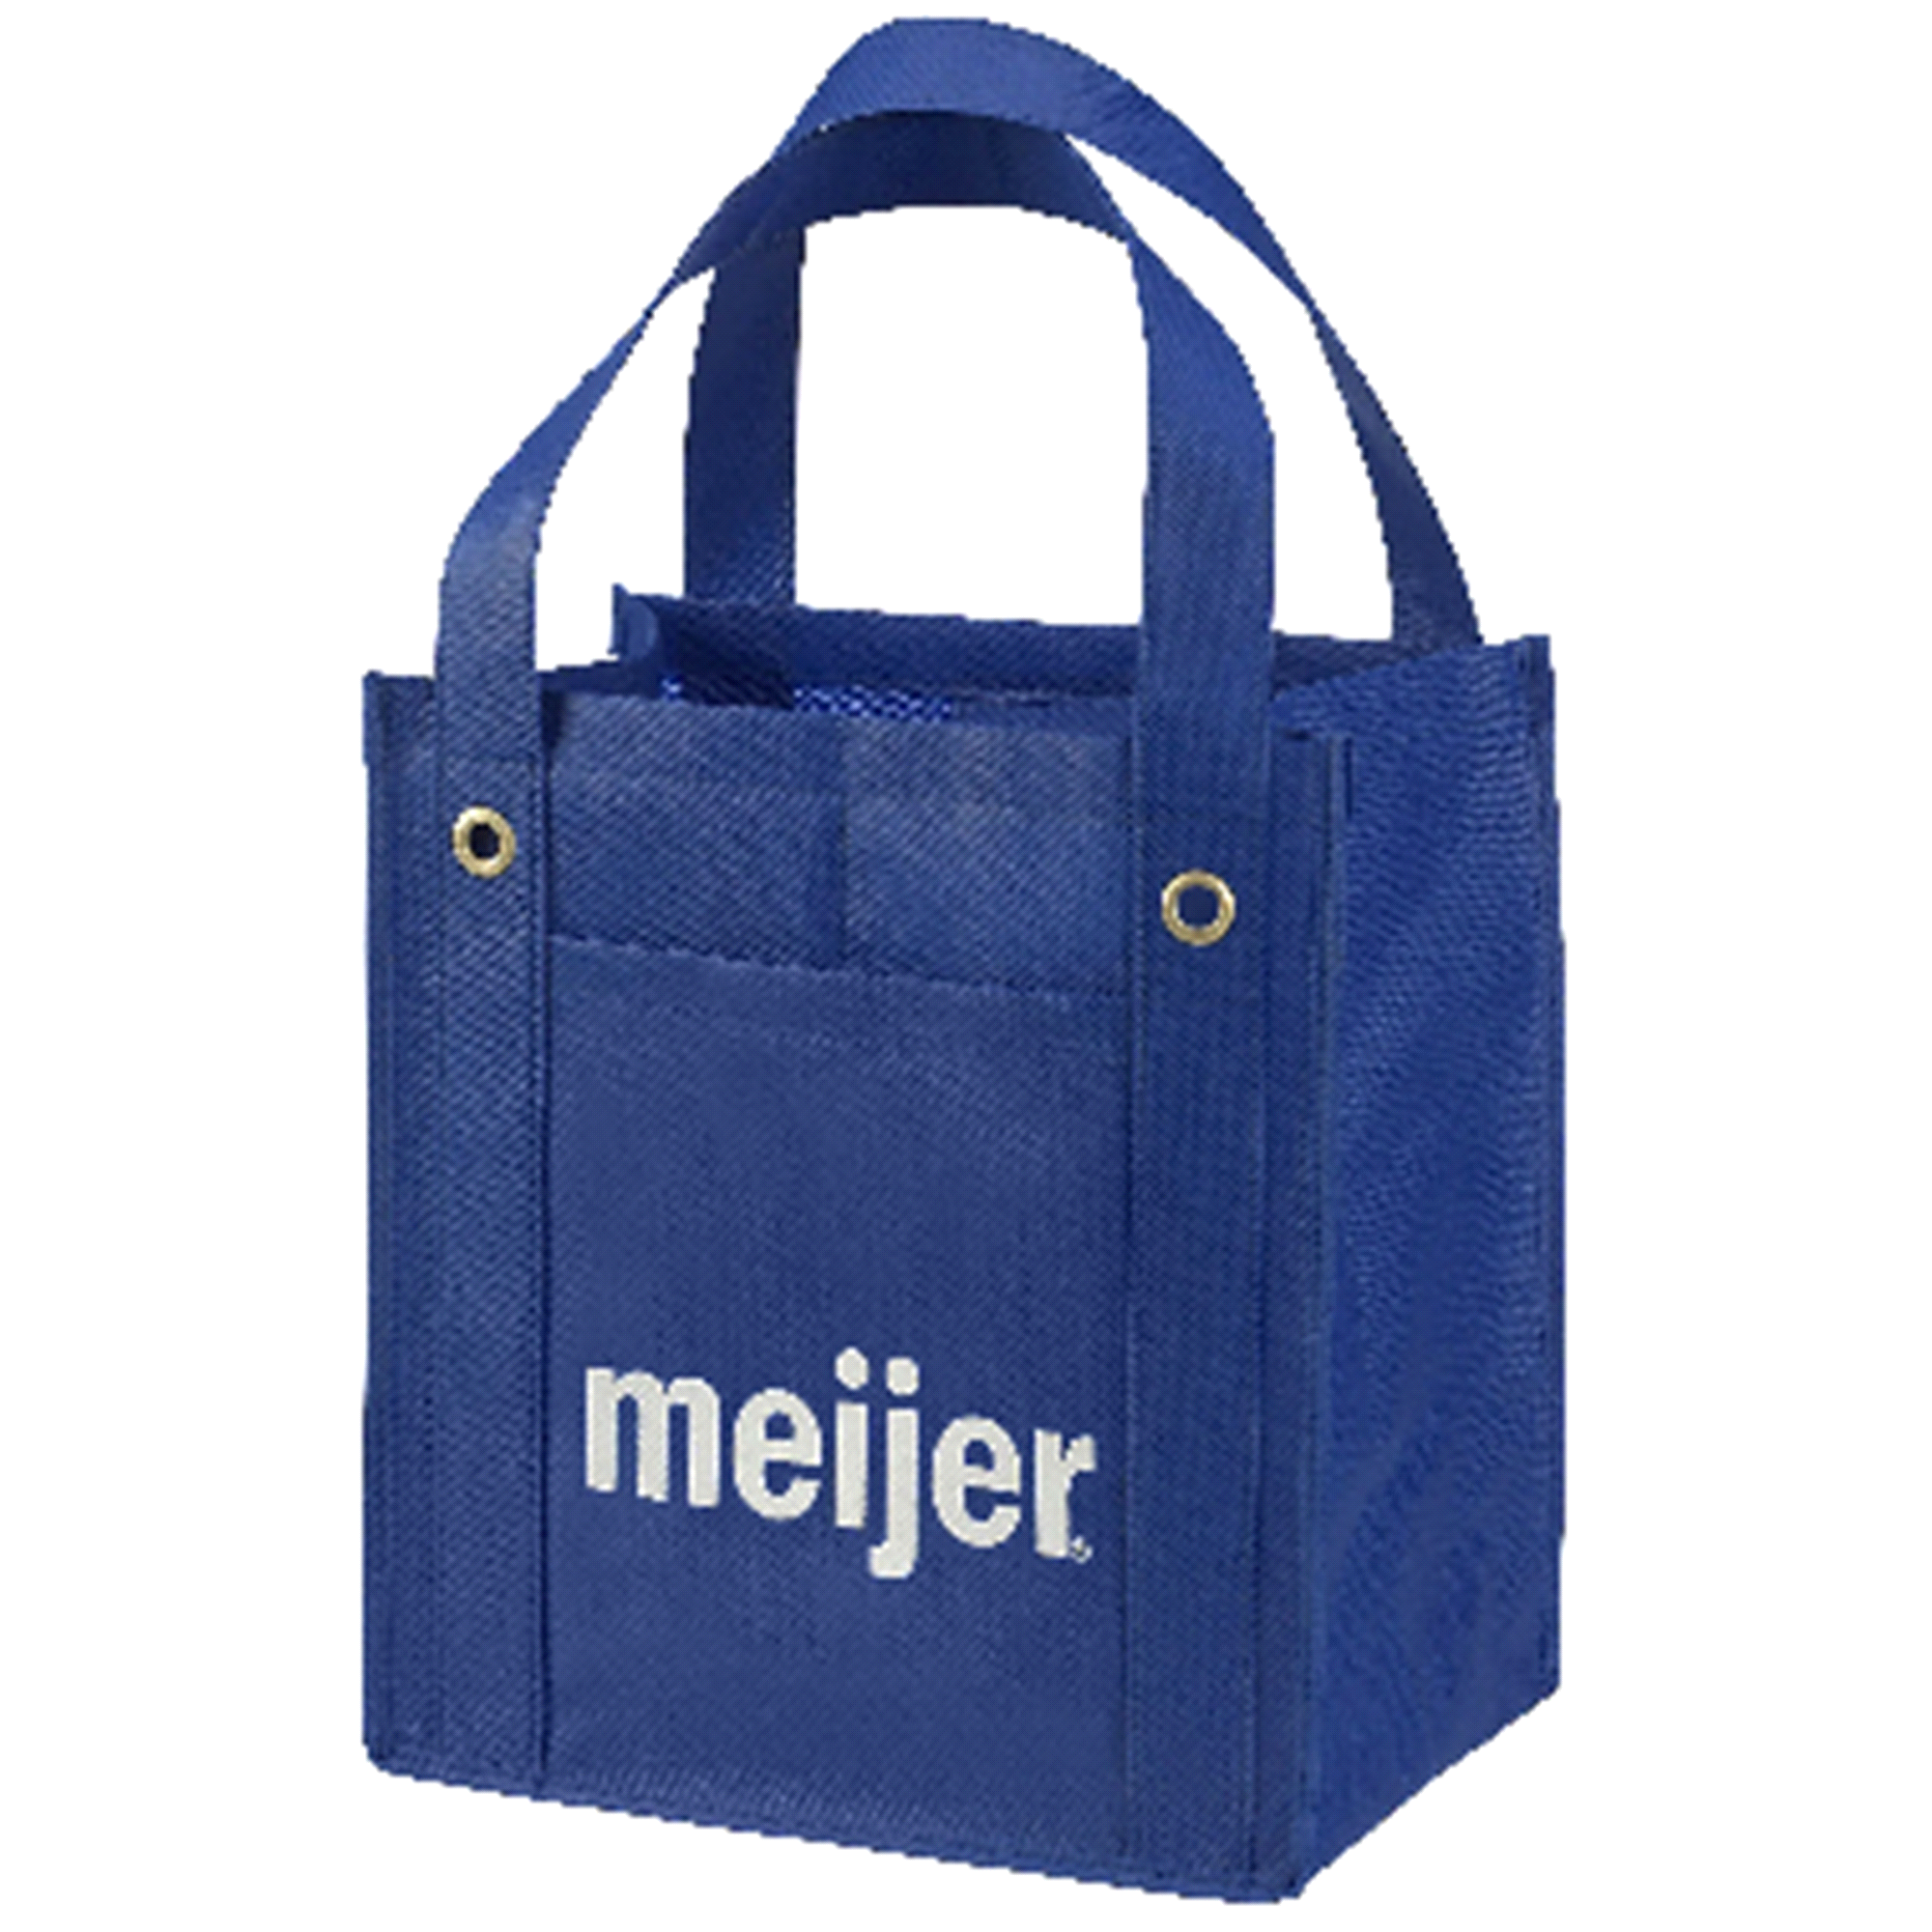 sc 1 st  Meijer & Food Storage Bags | Meijer.com